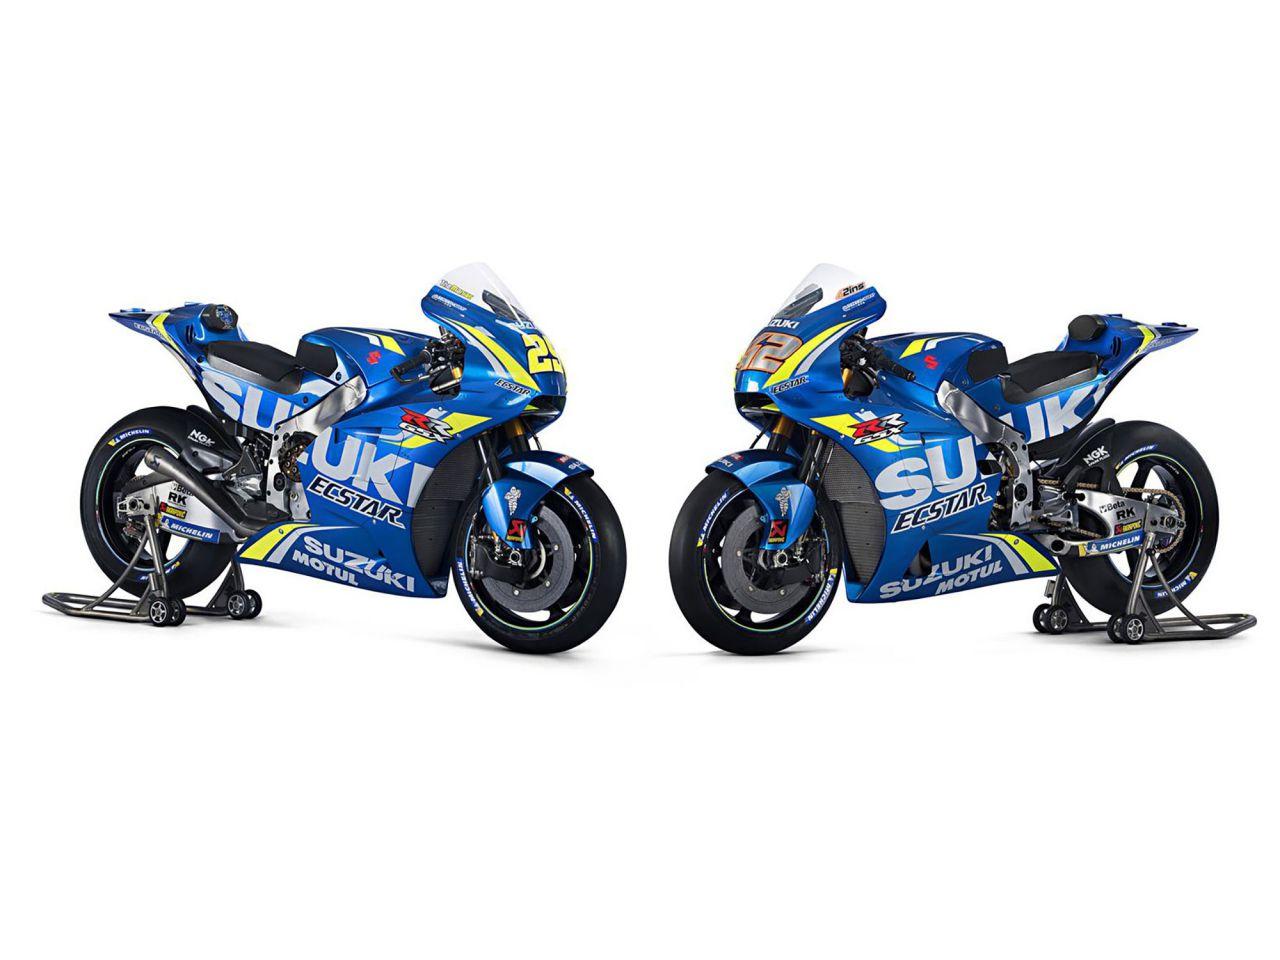 Powrót SUZUKI do MotoGP z GSX-RR!